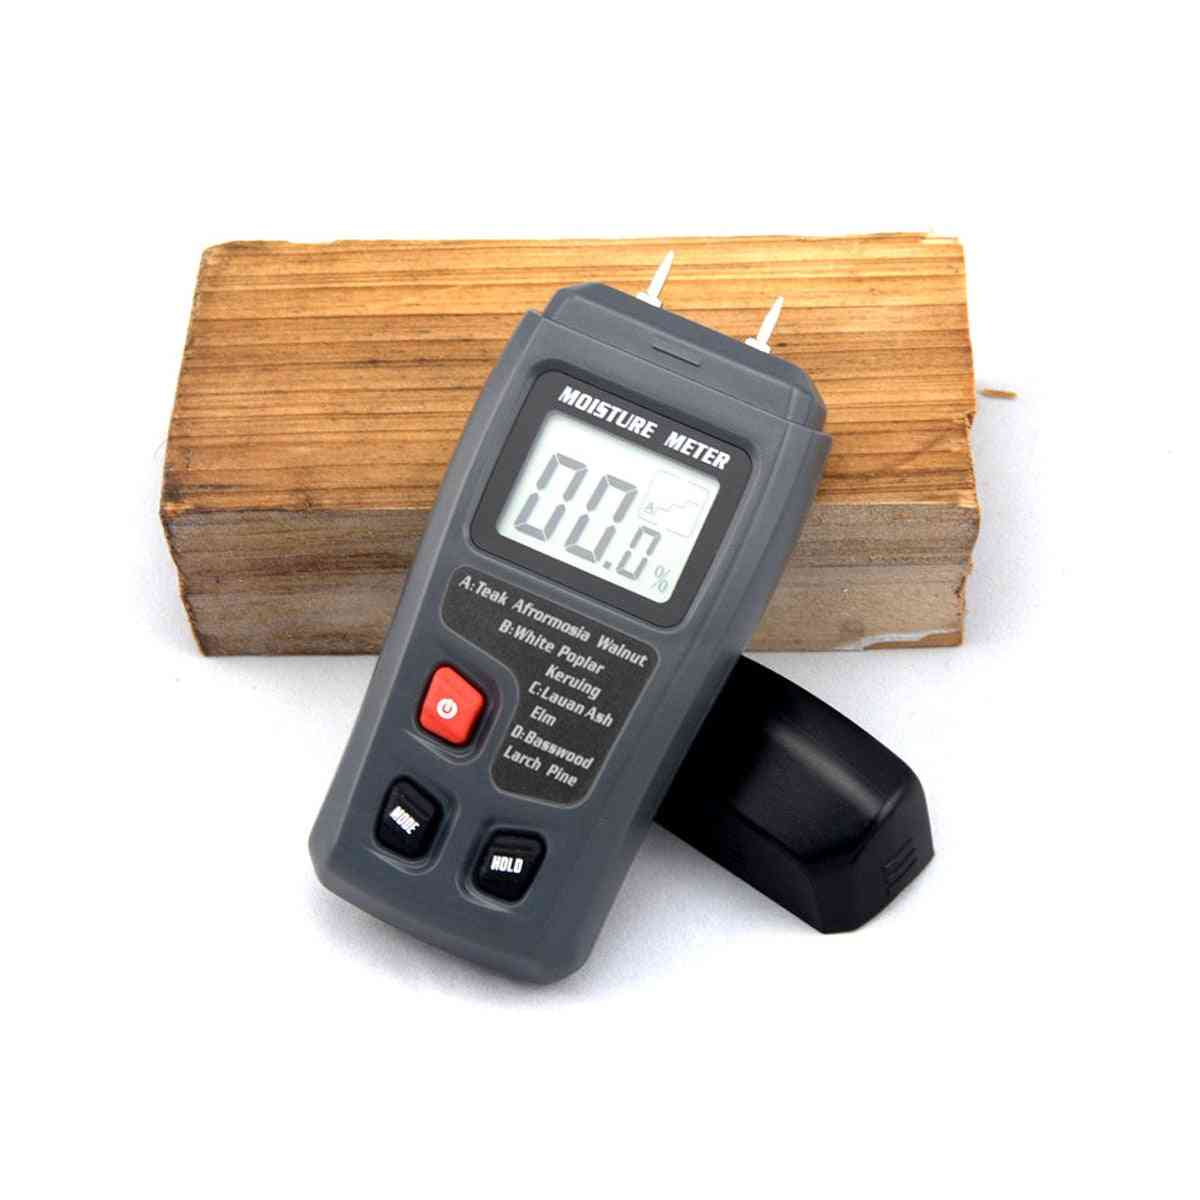 Two Pins Digital Wood Moisture Meter -hygrometer Timber Damp Detector Large Lcd Display